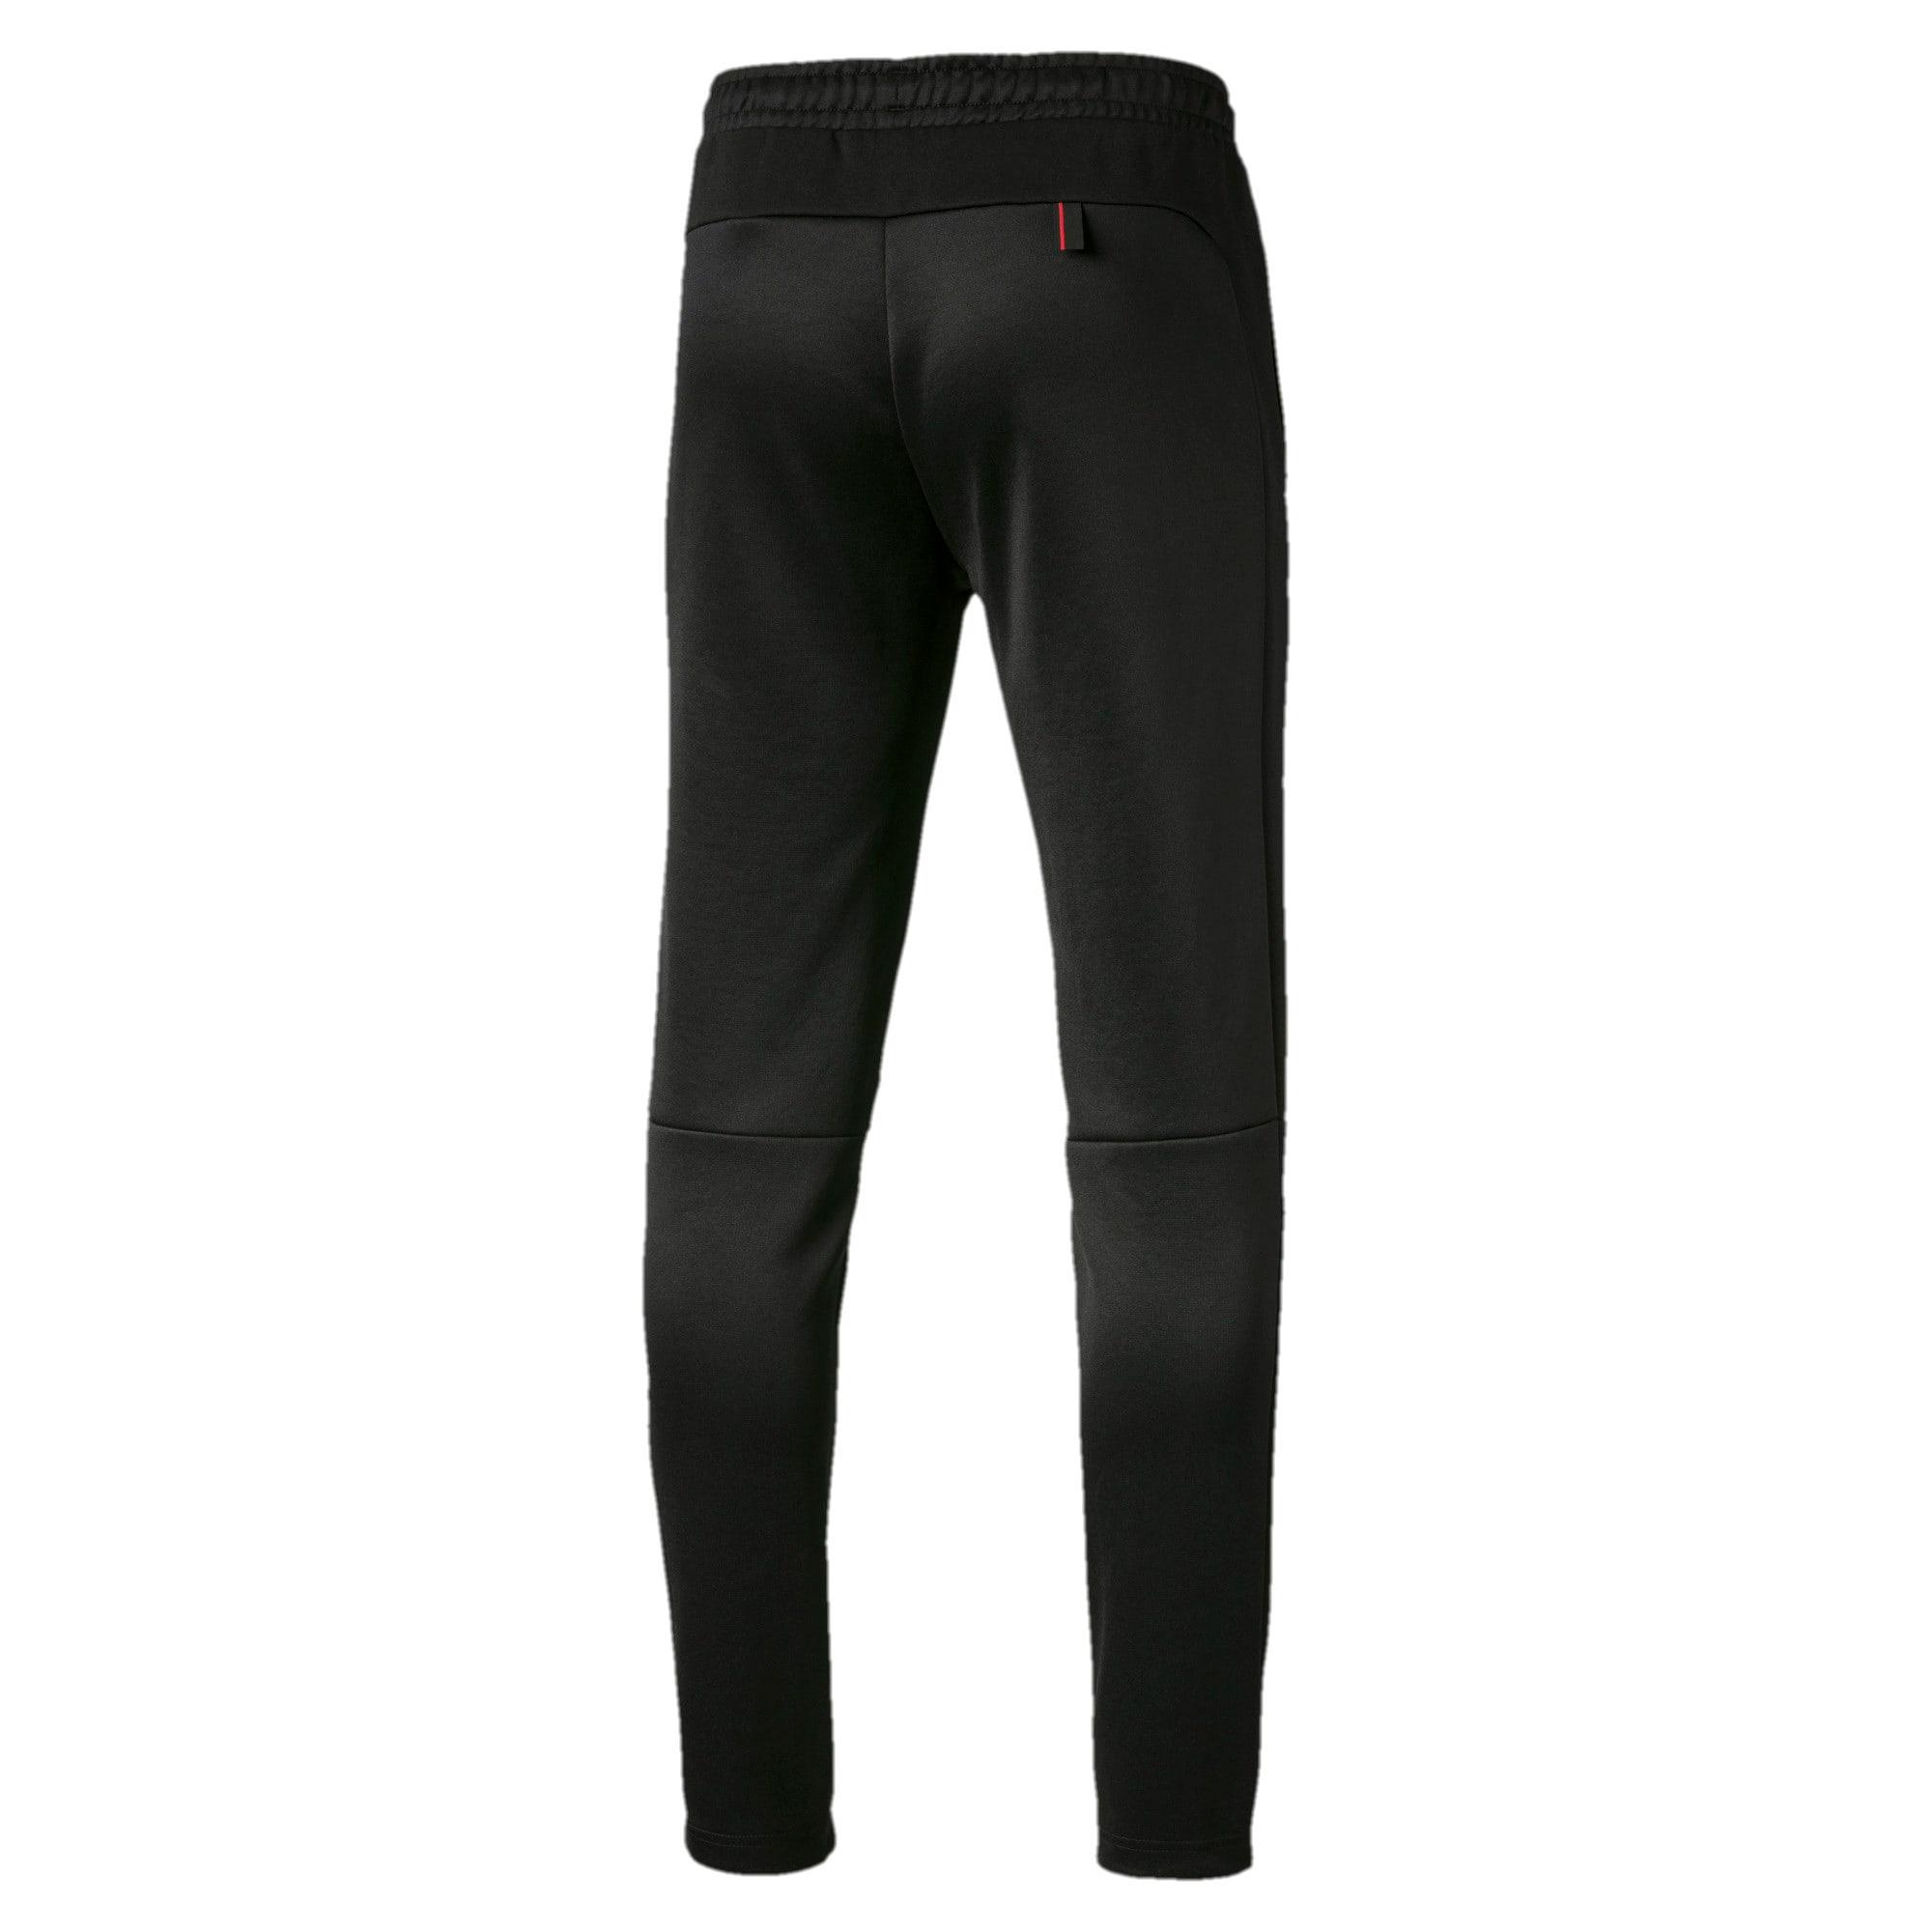 Thumbnail 2 of Ferrari Men's T7 Track Pants, Puma Black, medium